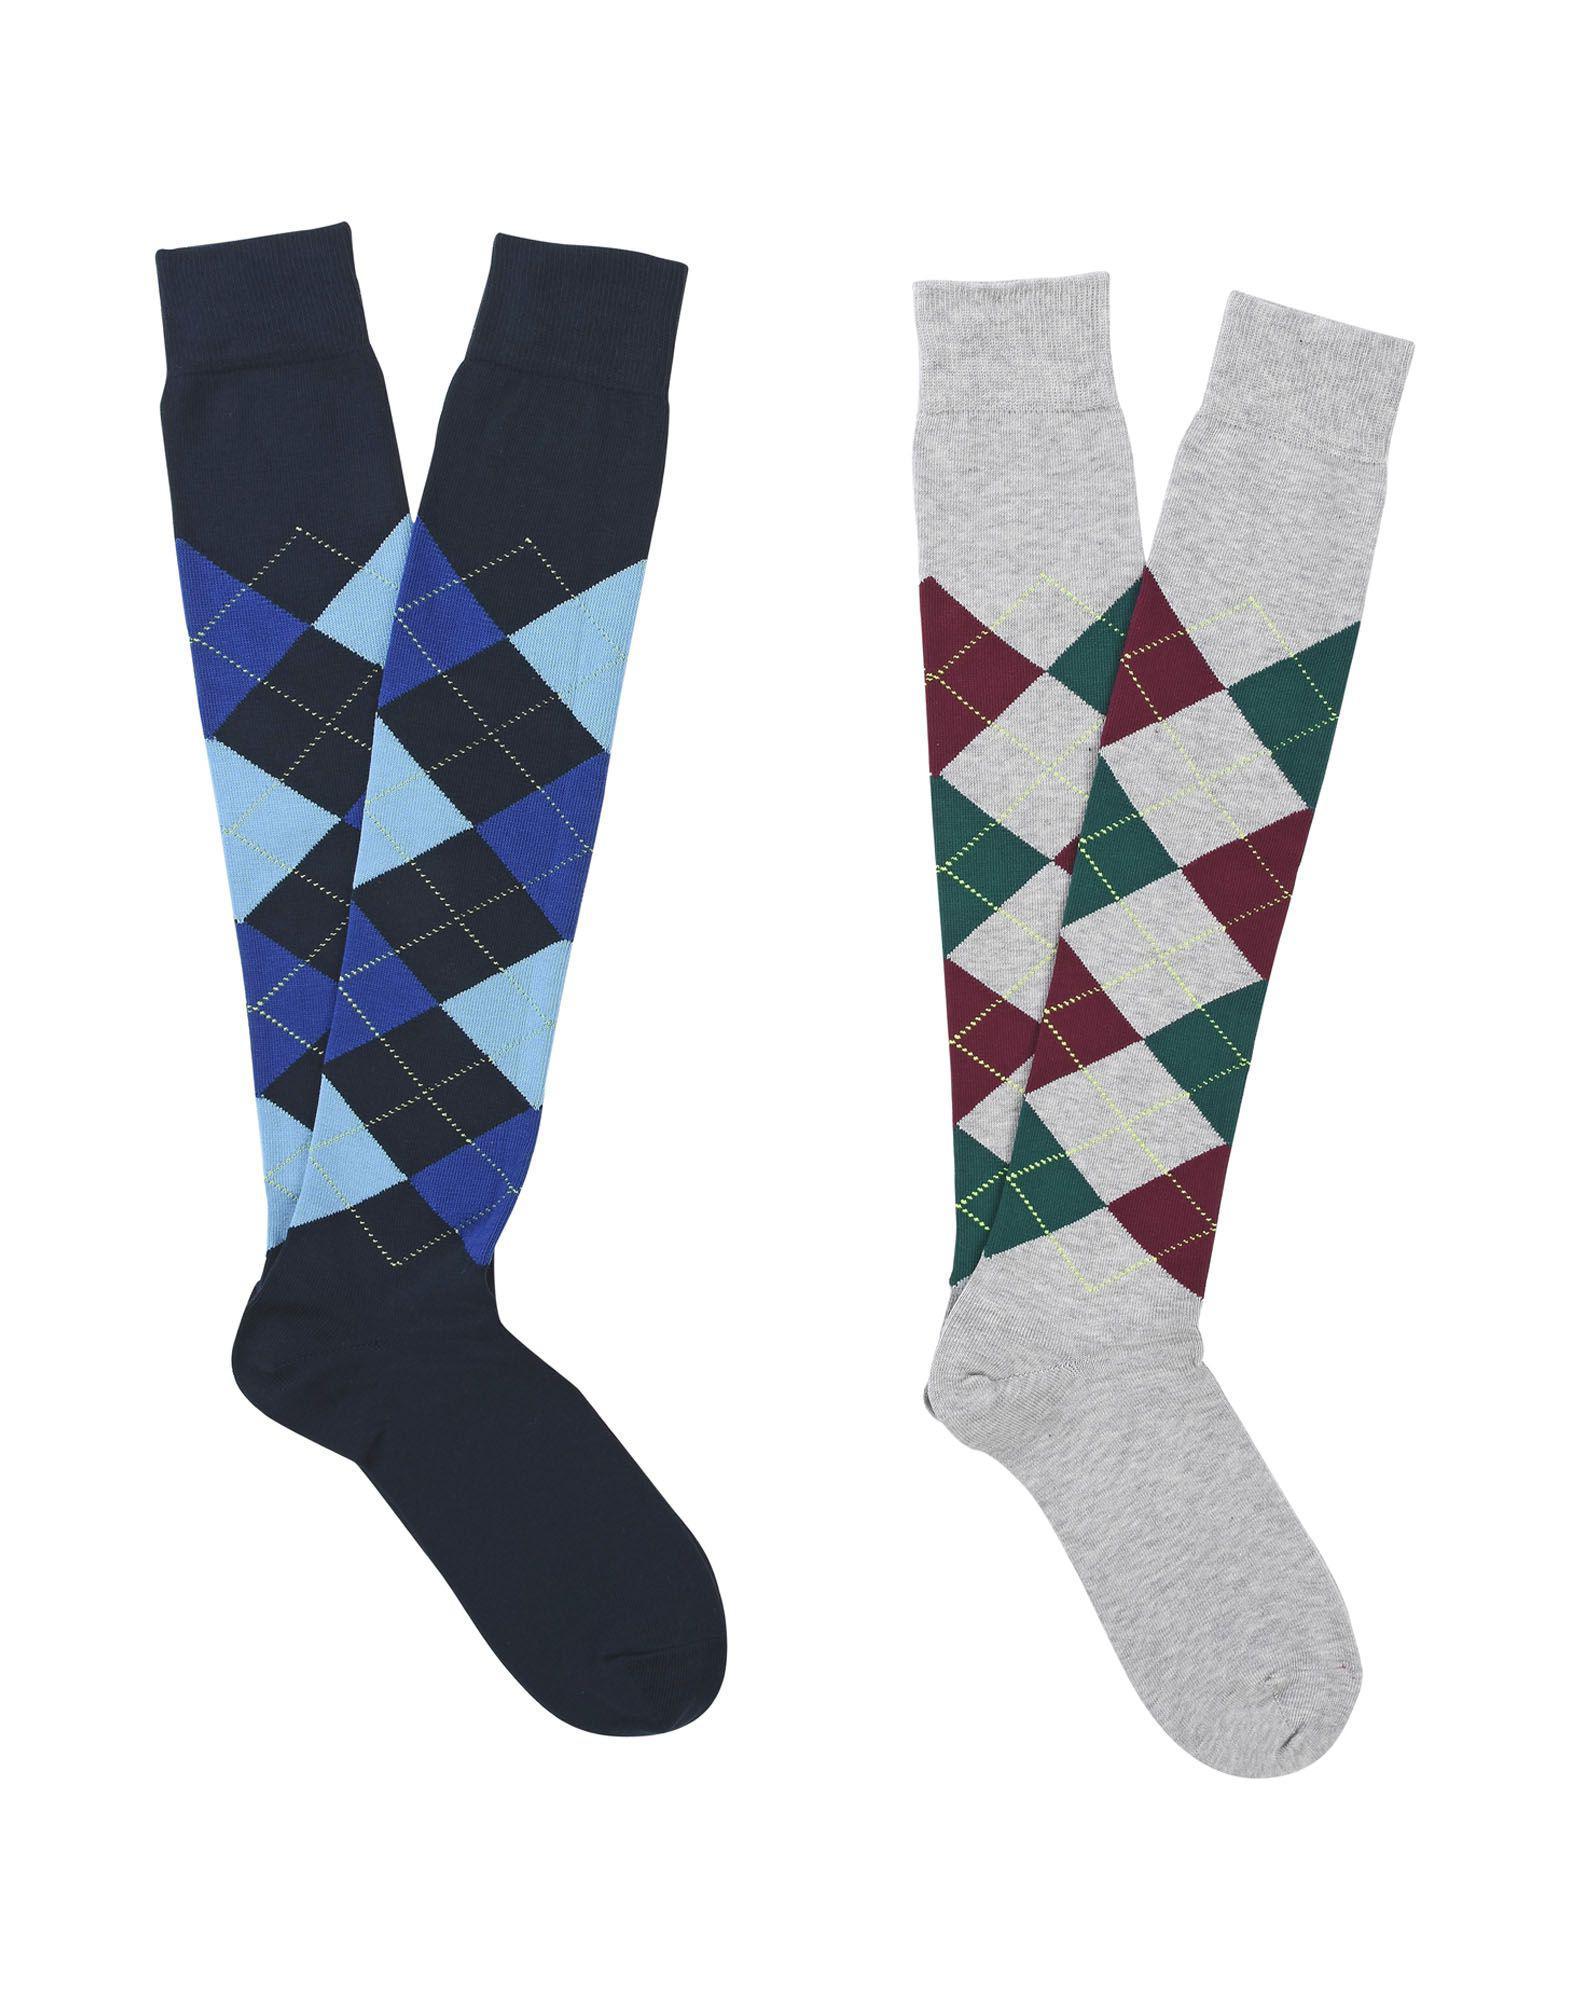 Mens Triangle Socks Burlington Purchase Cheap Online 4dN2oZ